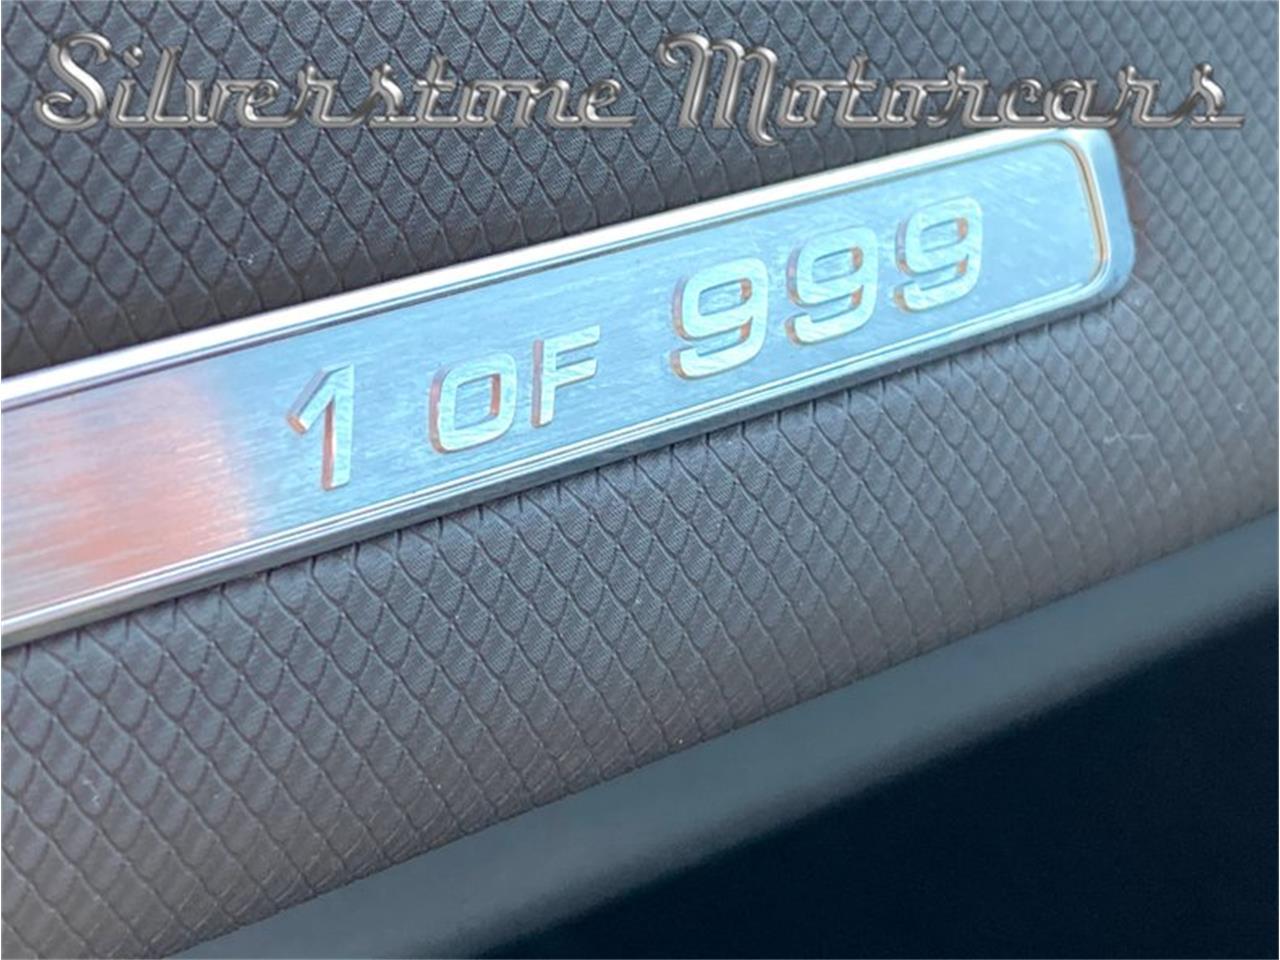 2018 Audi R8 (CC-1413699) for sale in North Andover, Massachusetts